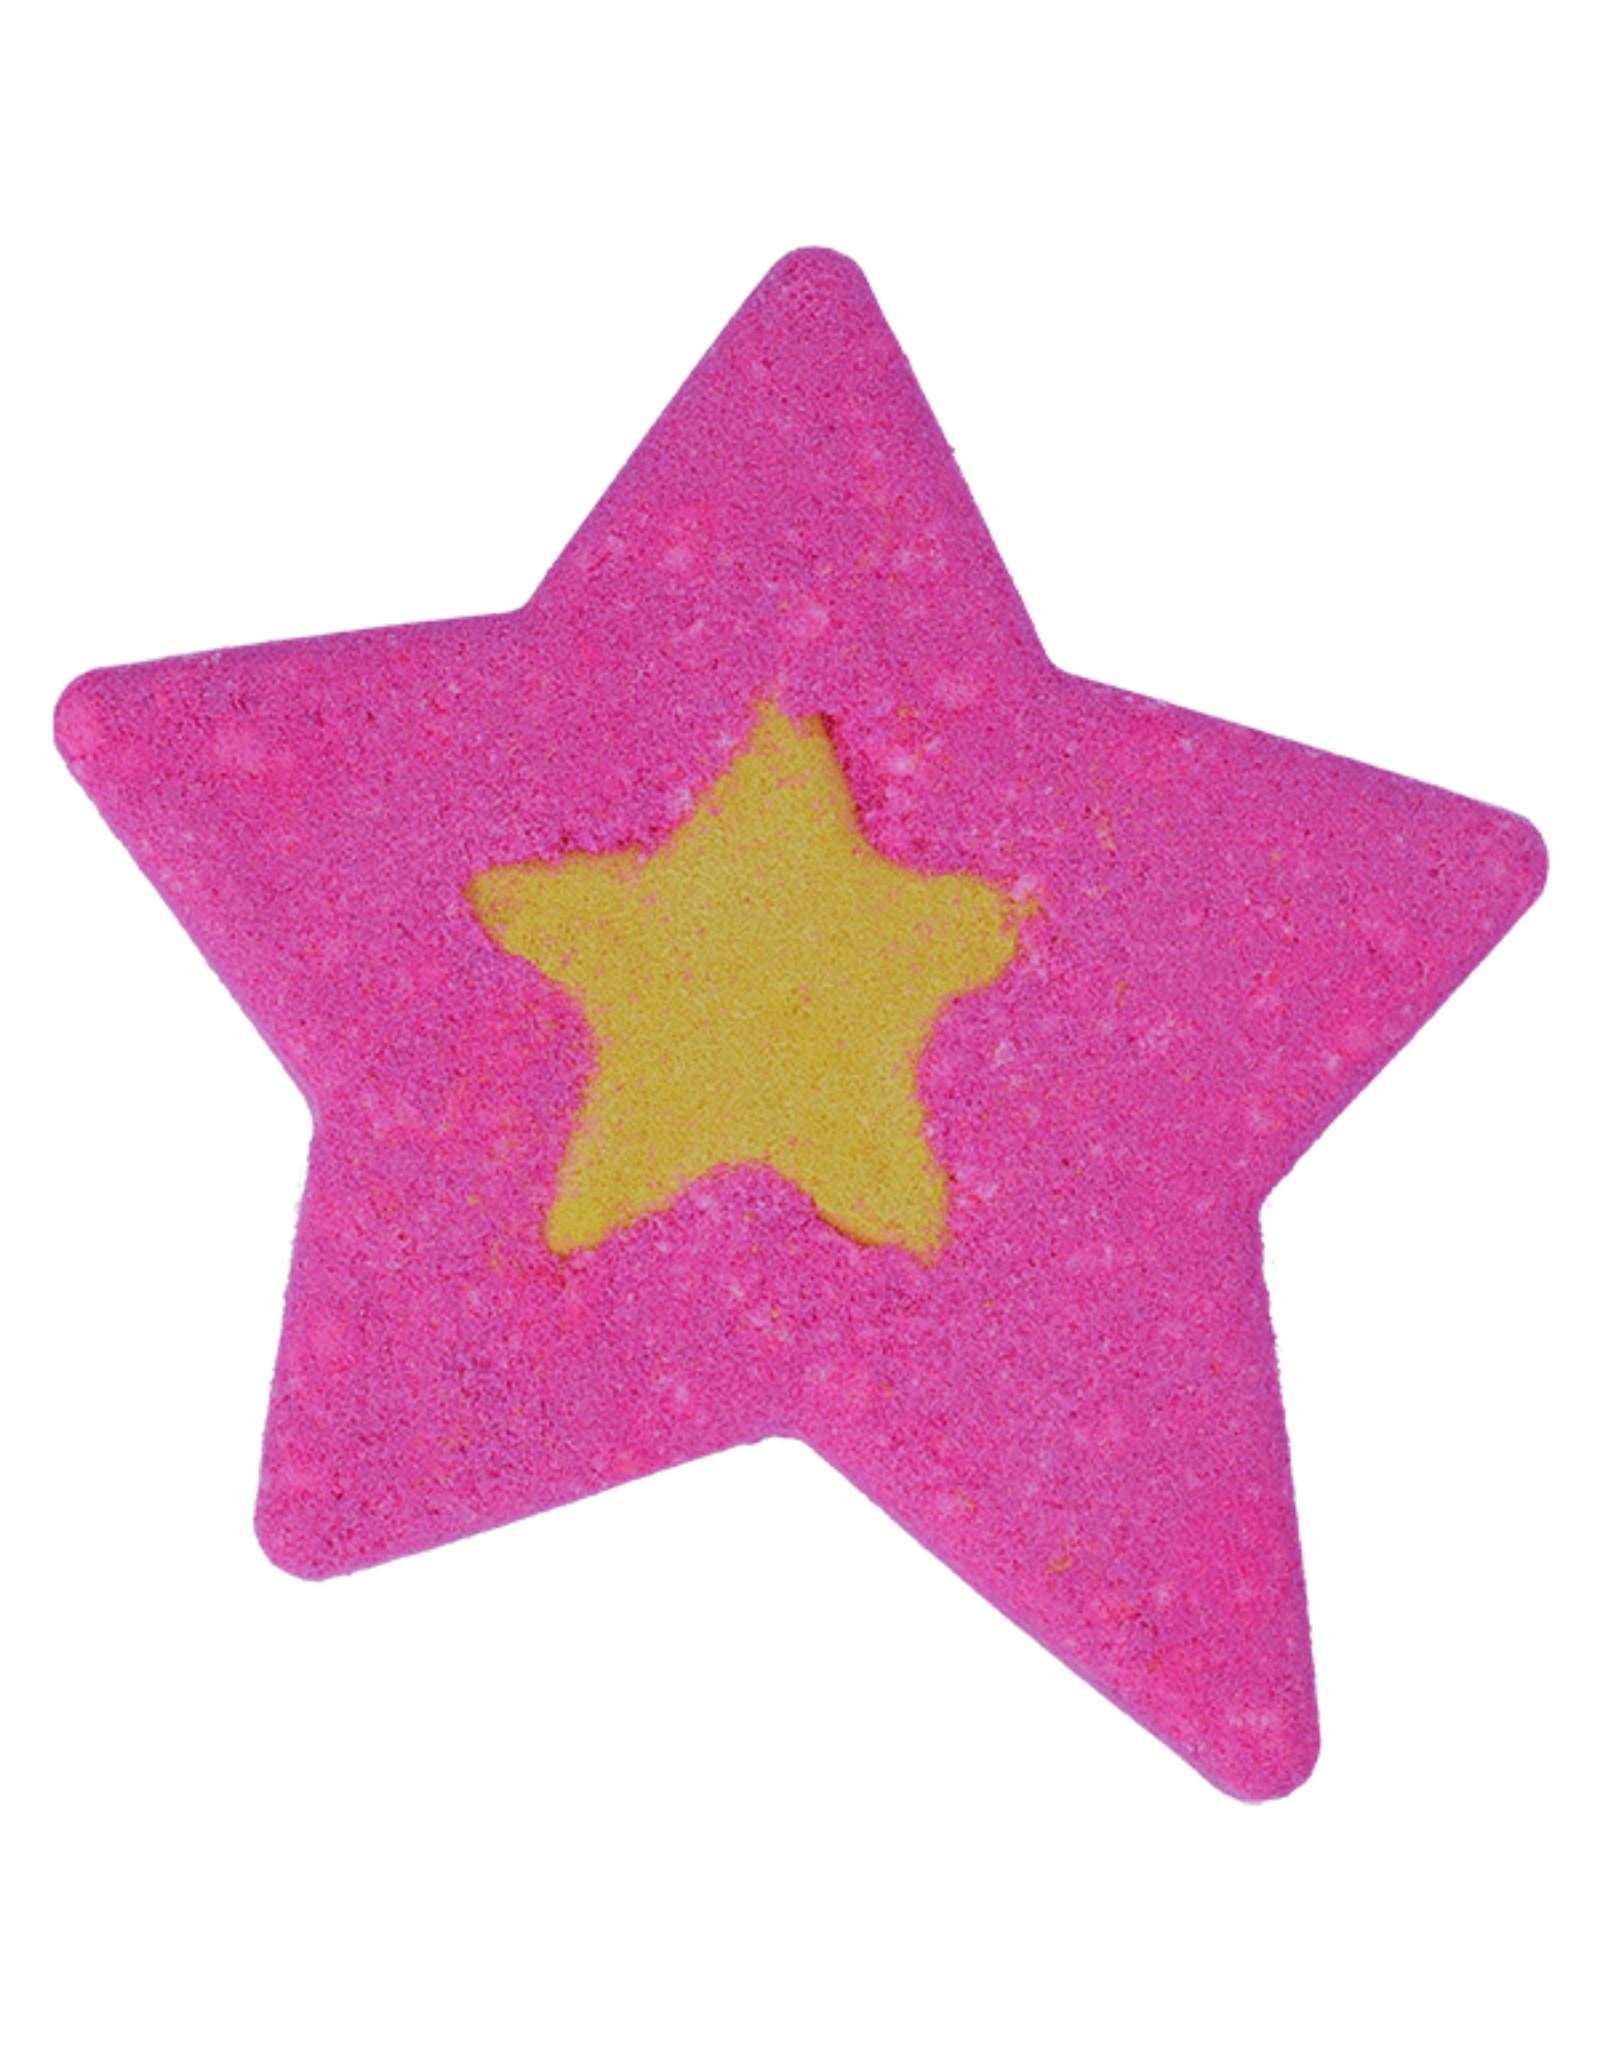 Bomb Cosmetics Bruisexplosie - A Star is Born